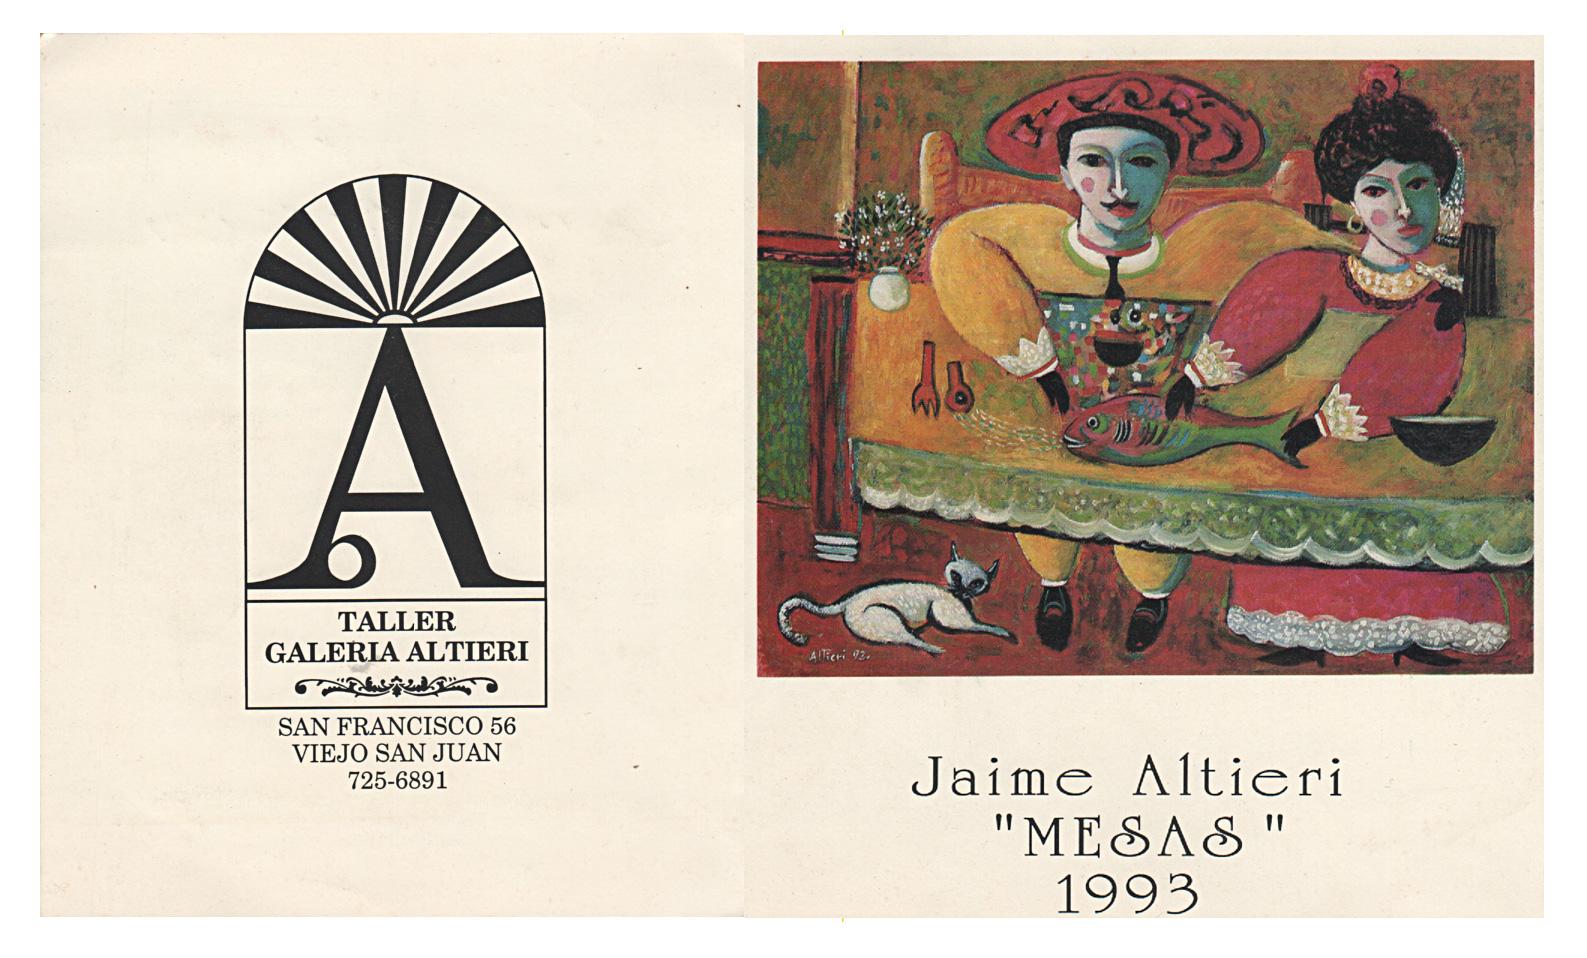 Catálogo de Jaime Altieri Pintura / catálogos de arte una colección